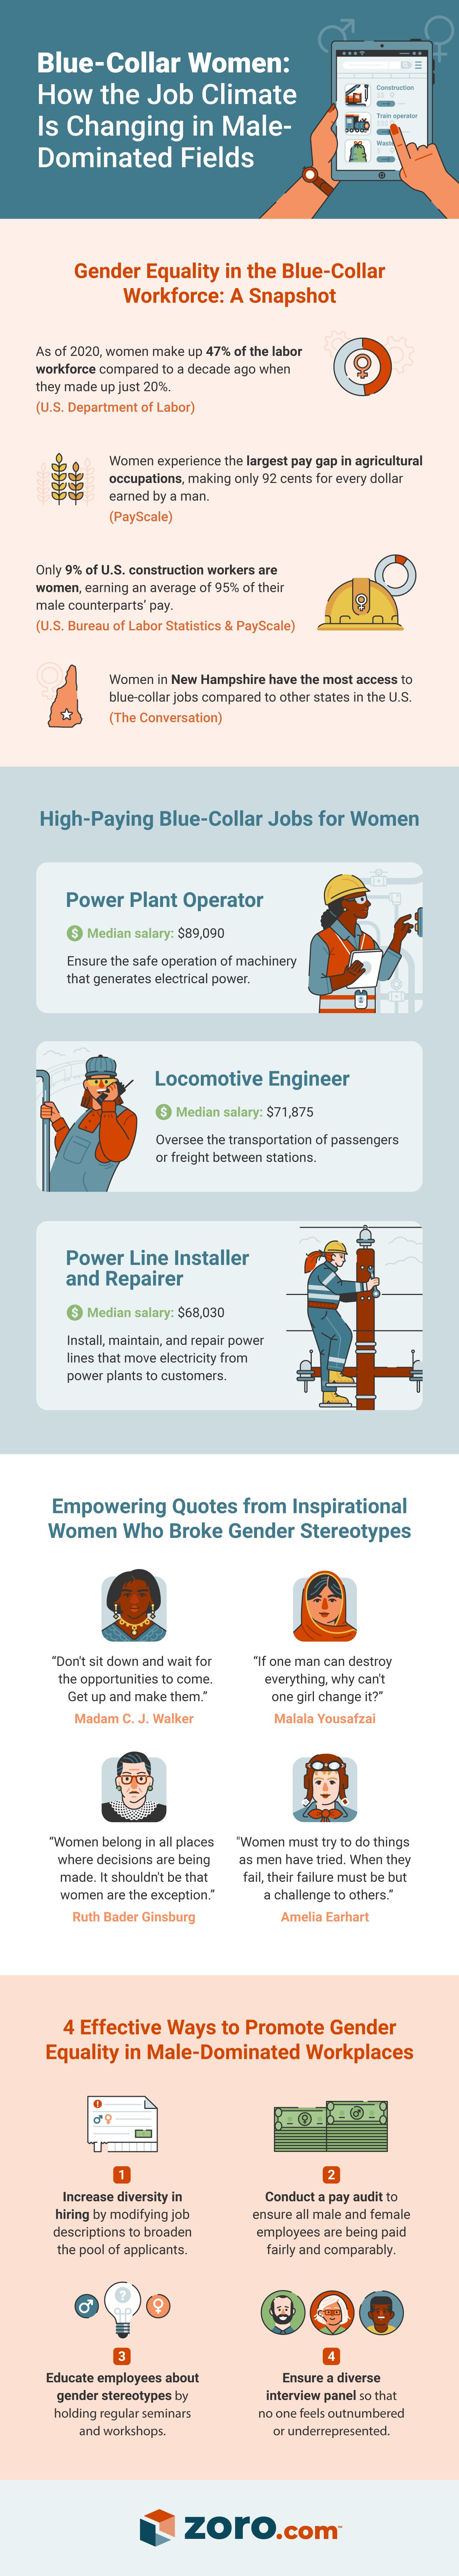 women-in-blue-collar-jobs